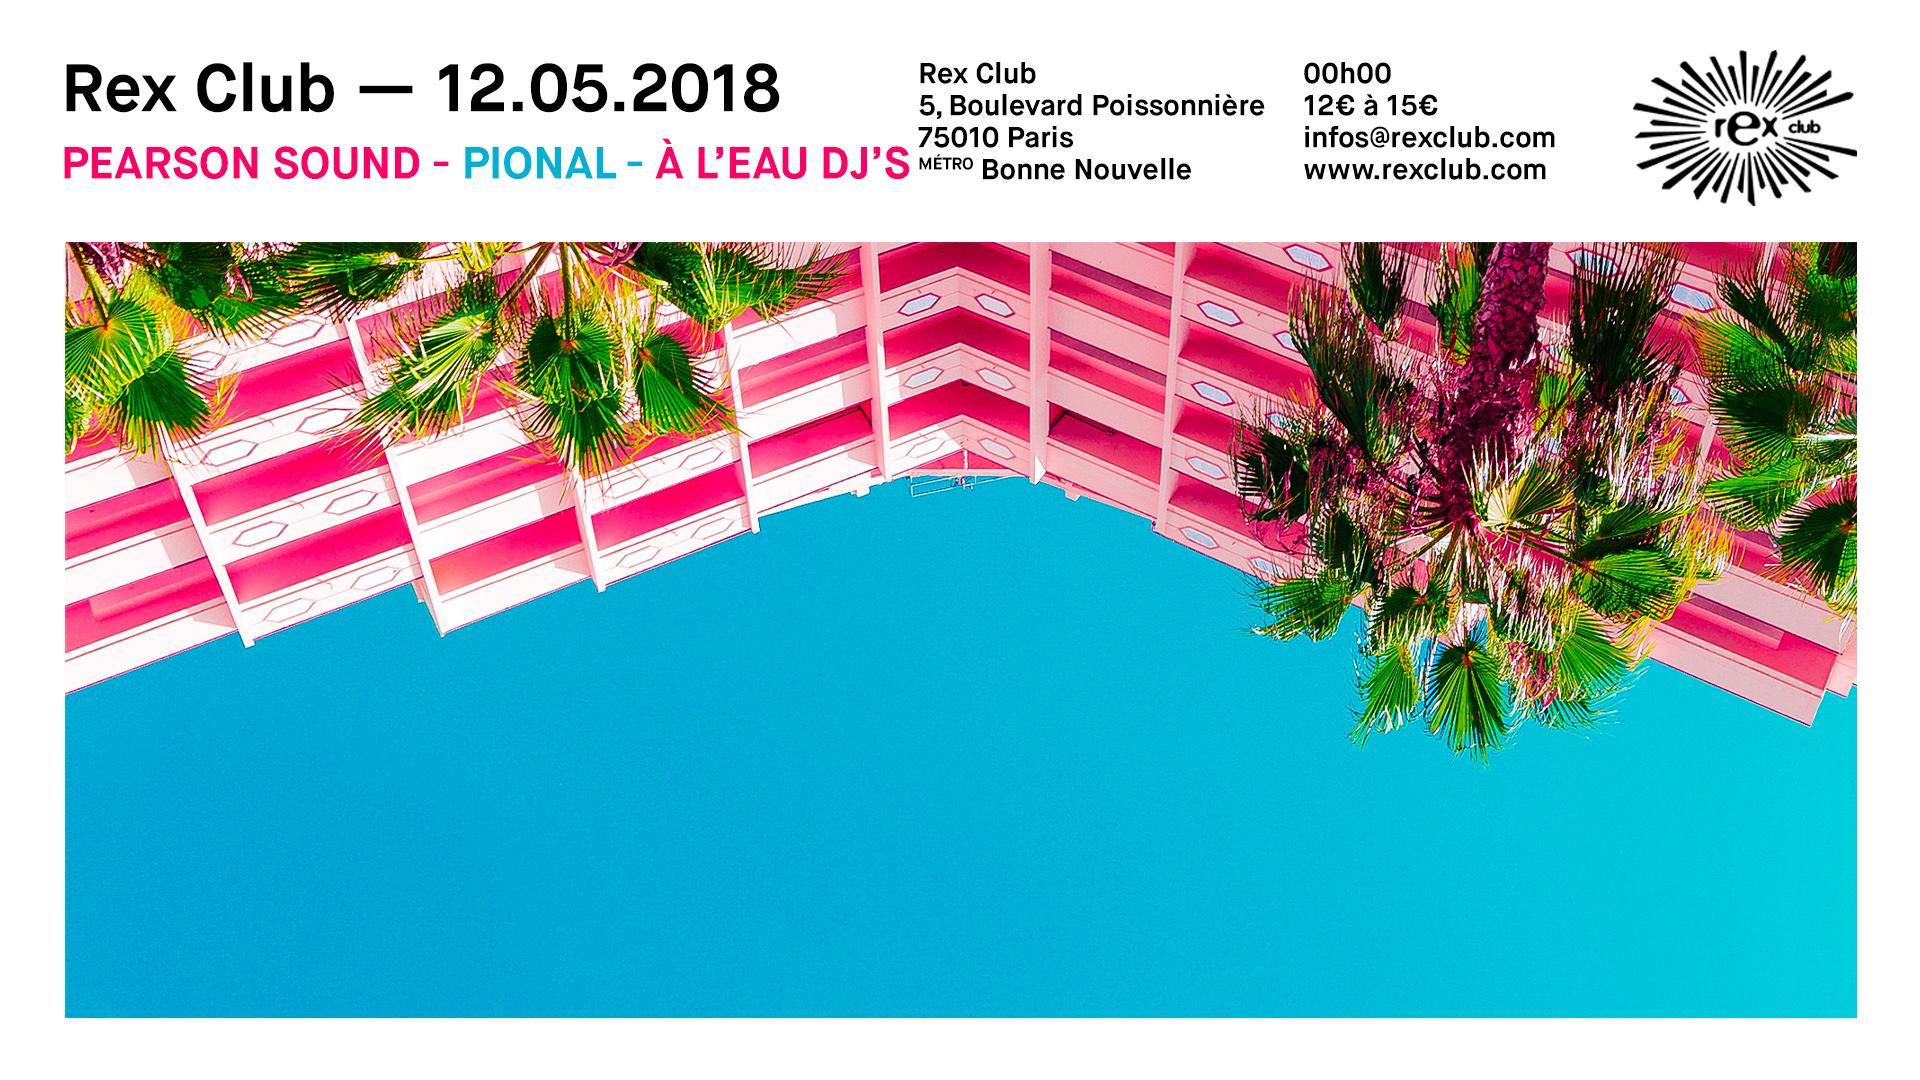 REX CLUB : Pearson Sound, Pional, À l'eau Dj's